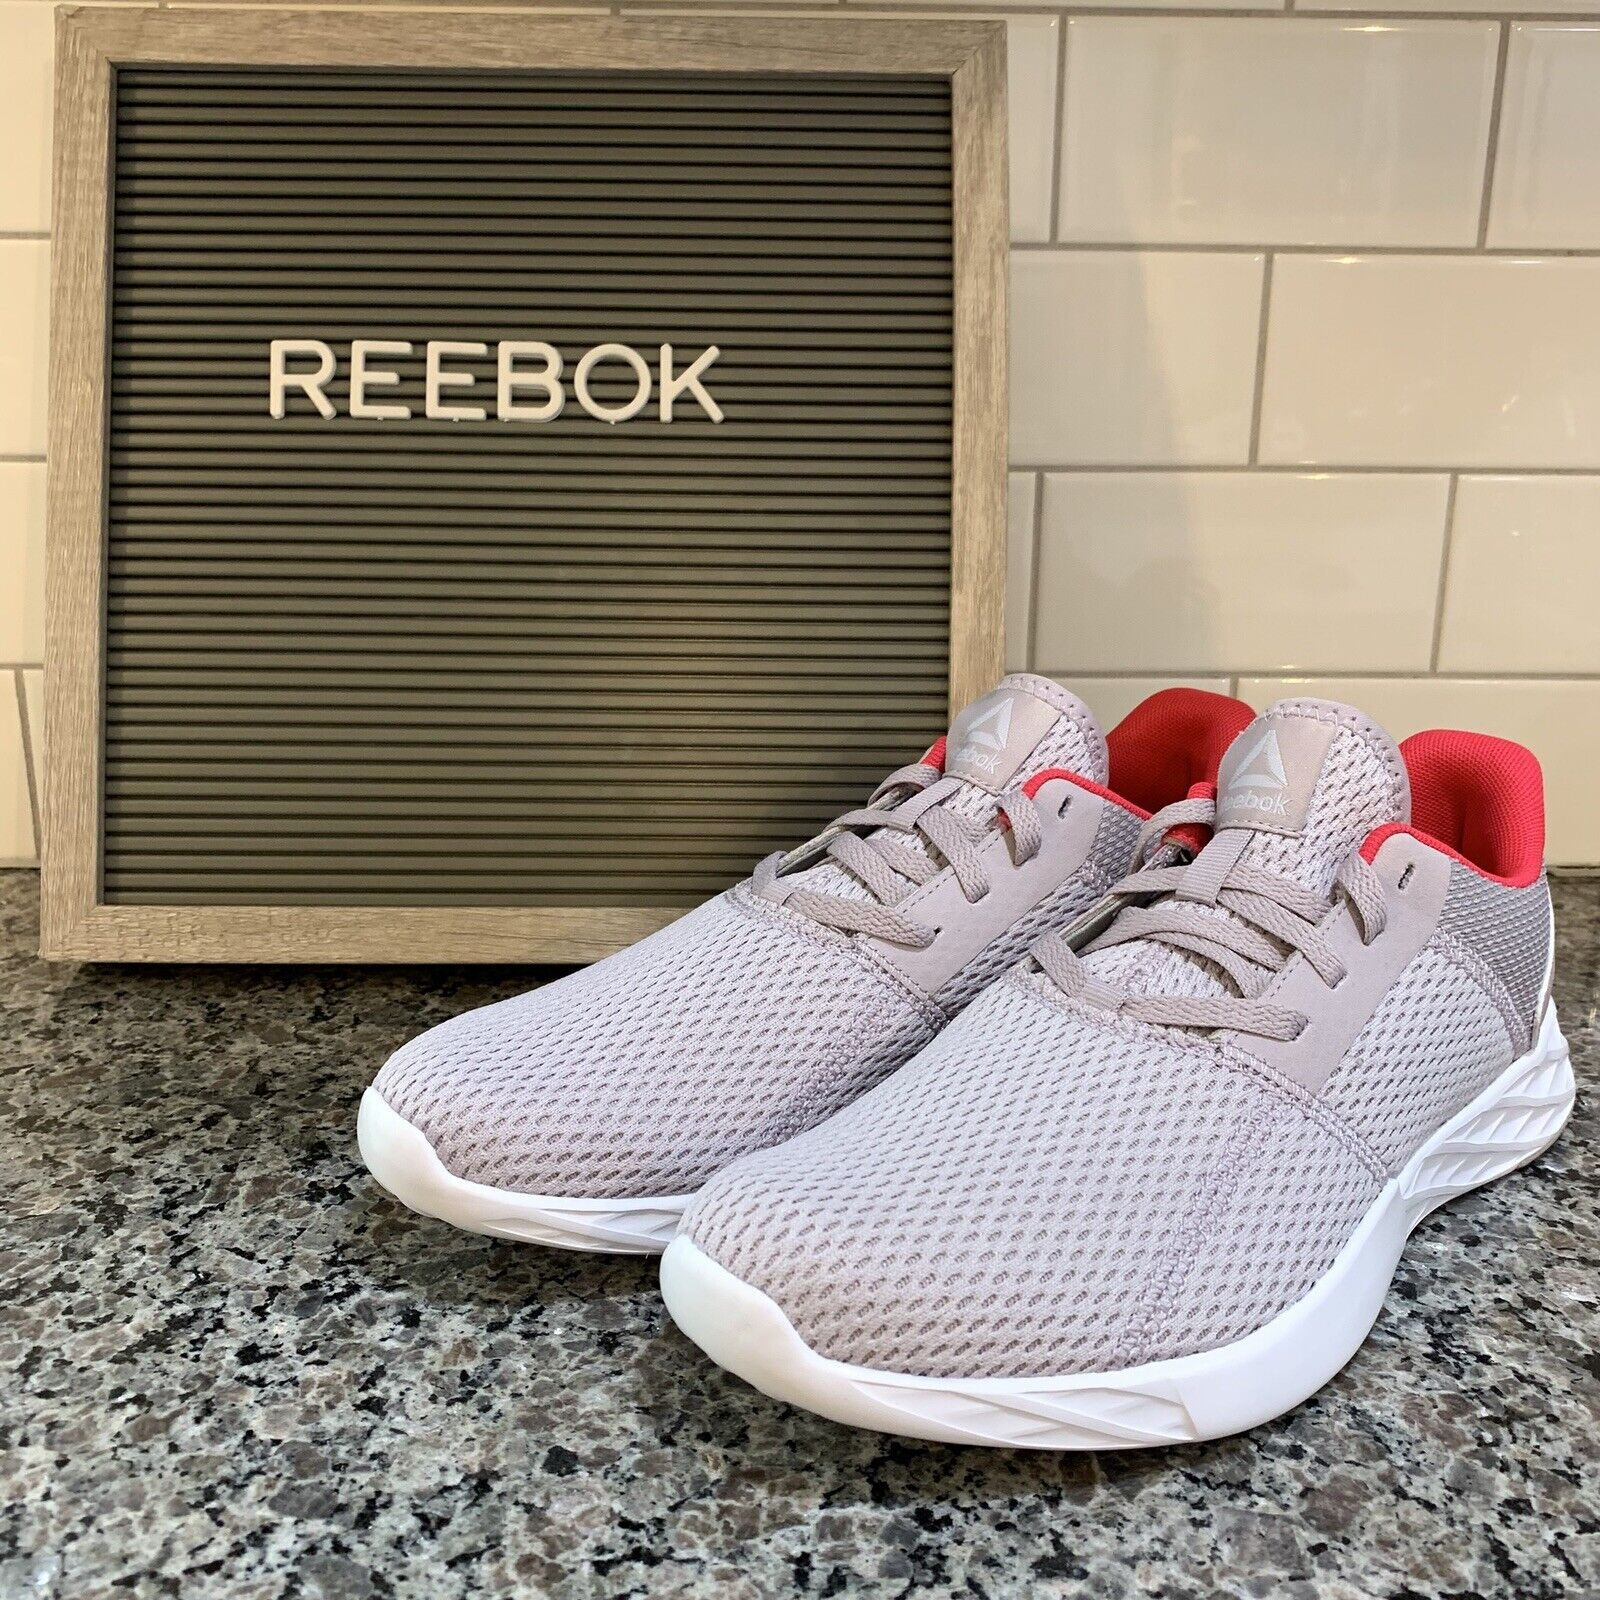 Reebok Women's Astroride Strike Running shoes Purple pink Size 9